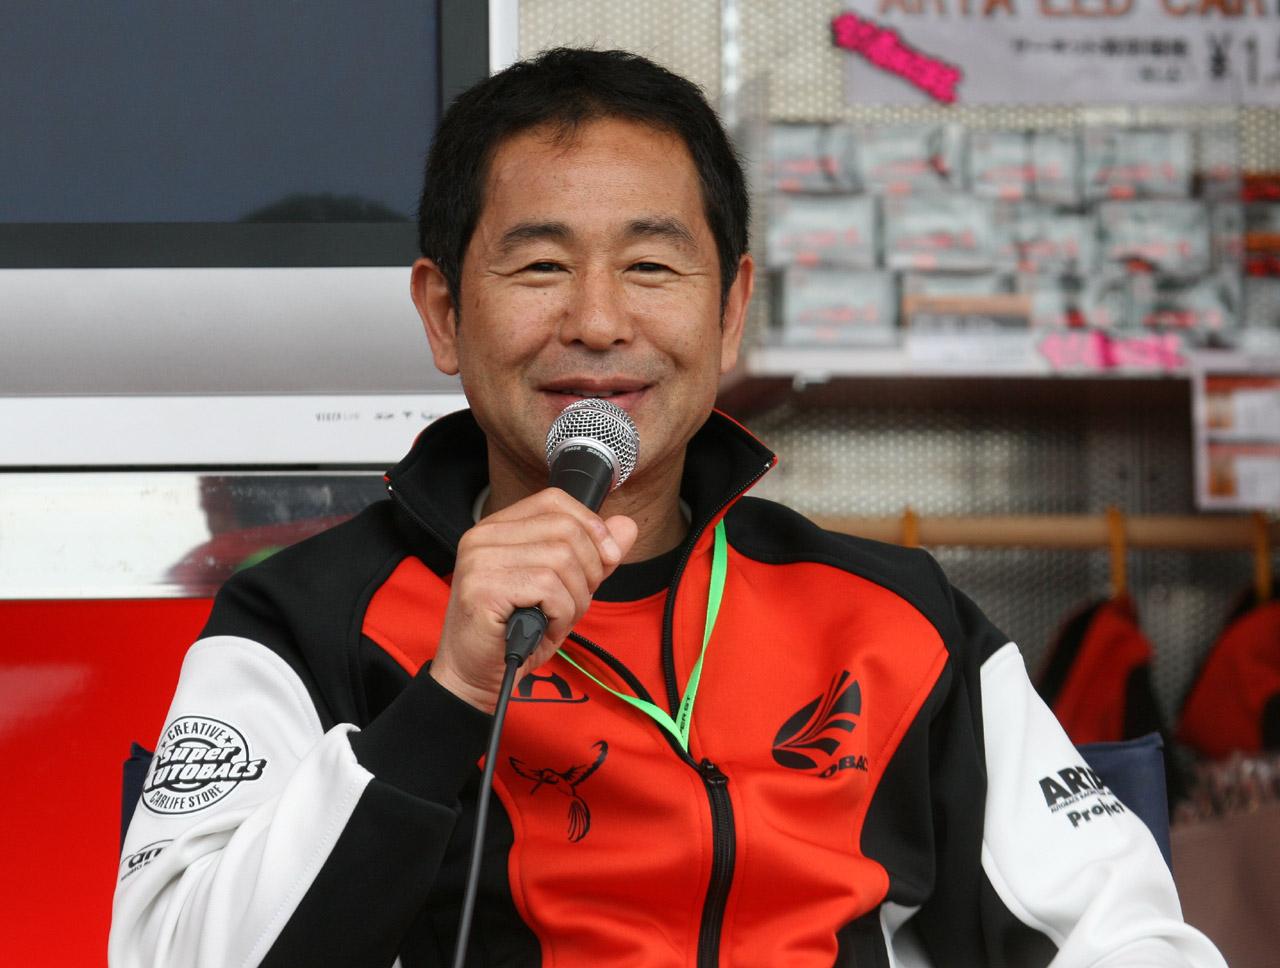 http://upload.wikimedia.org/wikipedia/commons/1/1e/Keiichi_Tsuchiya_2008_Super_GT.jpg